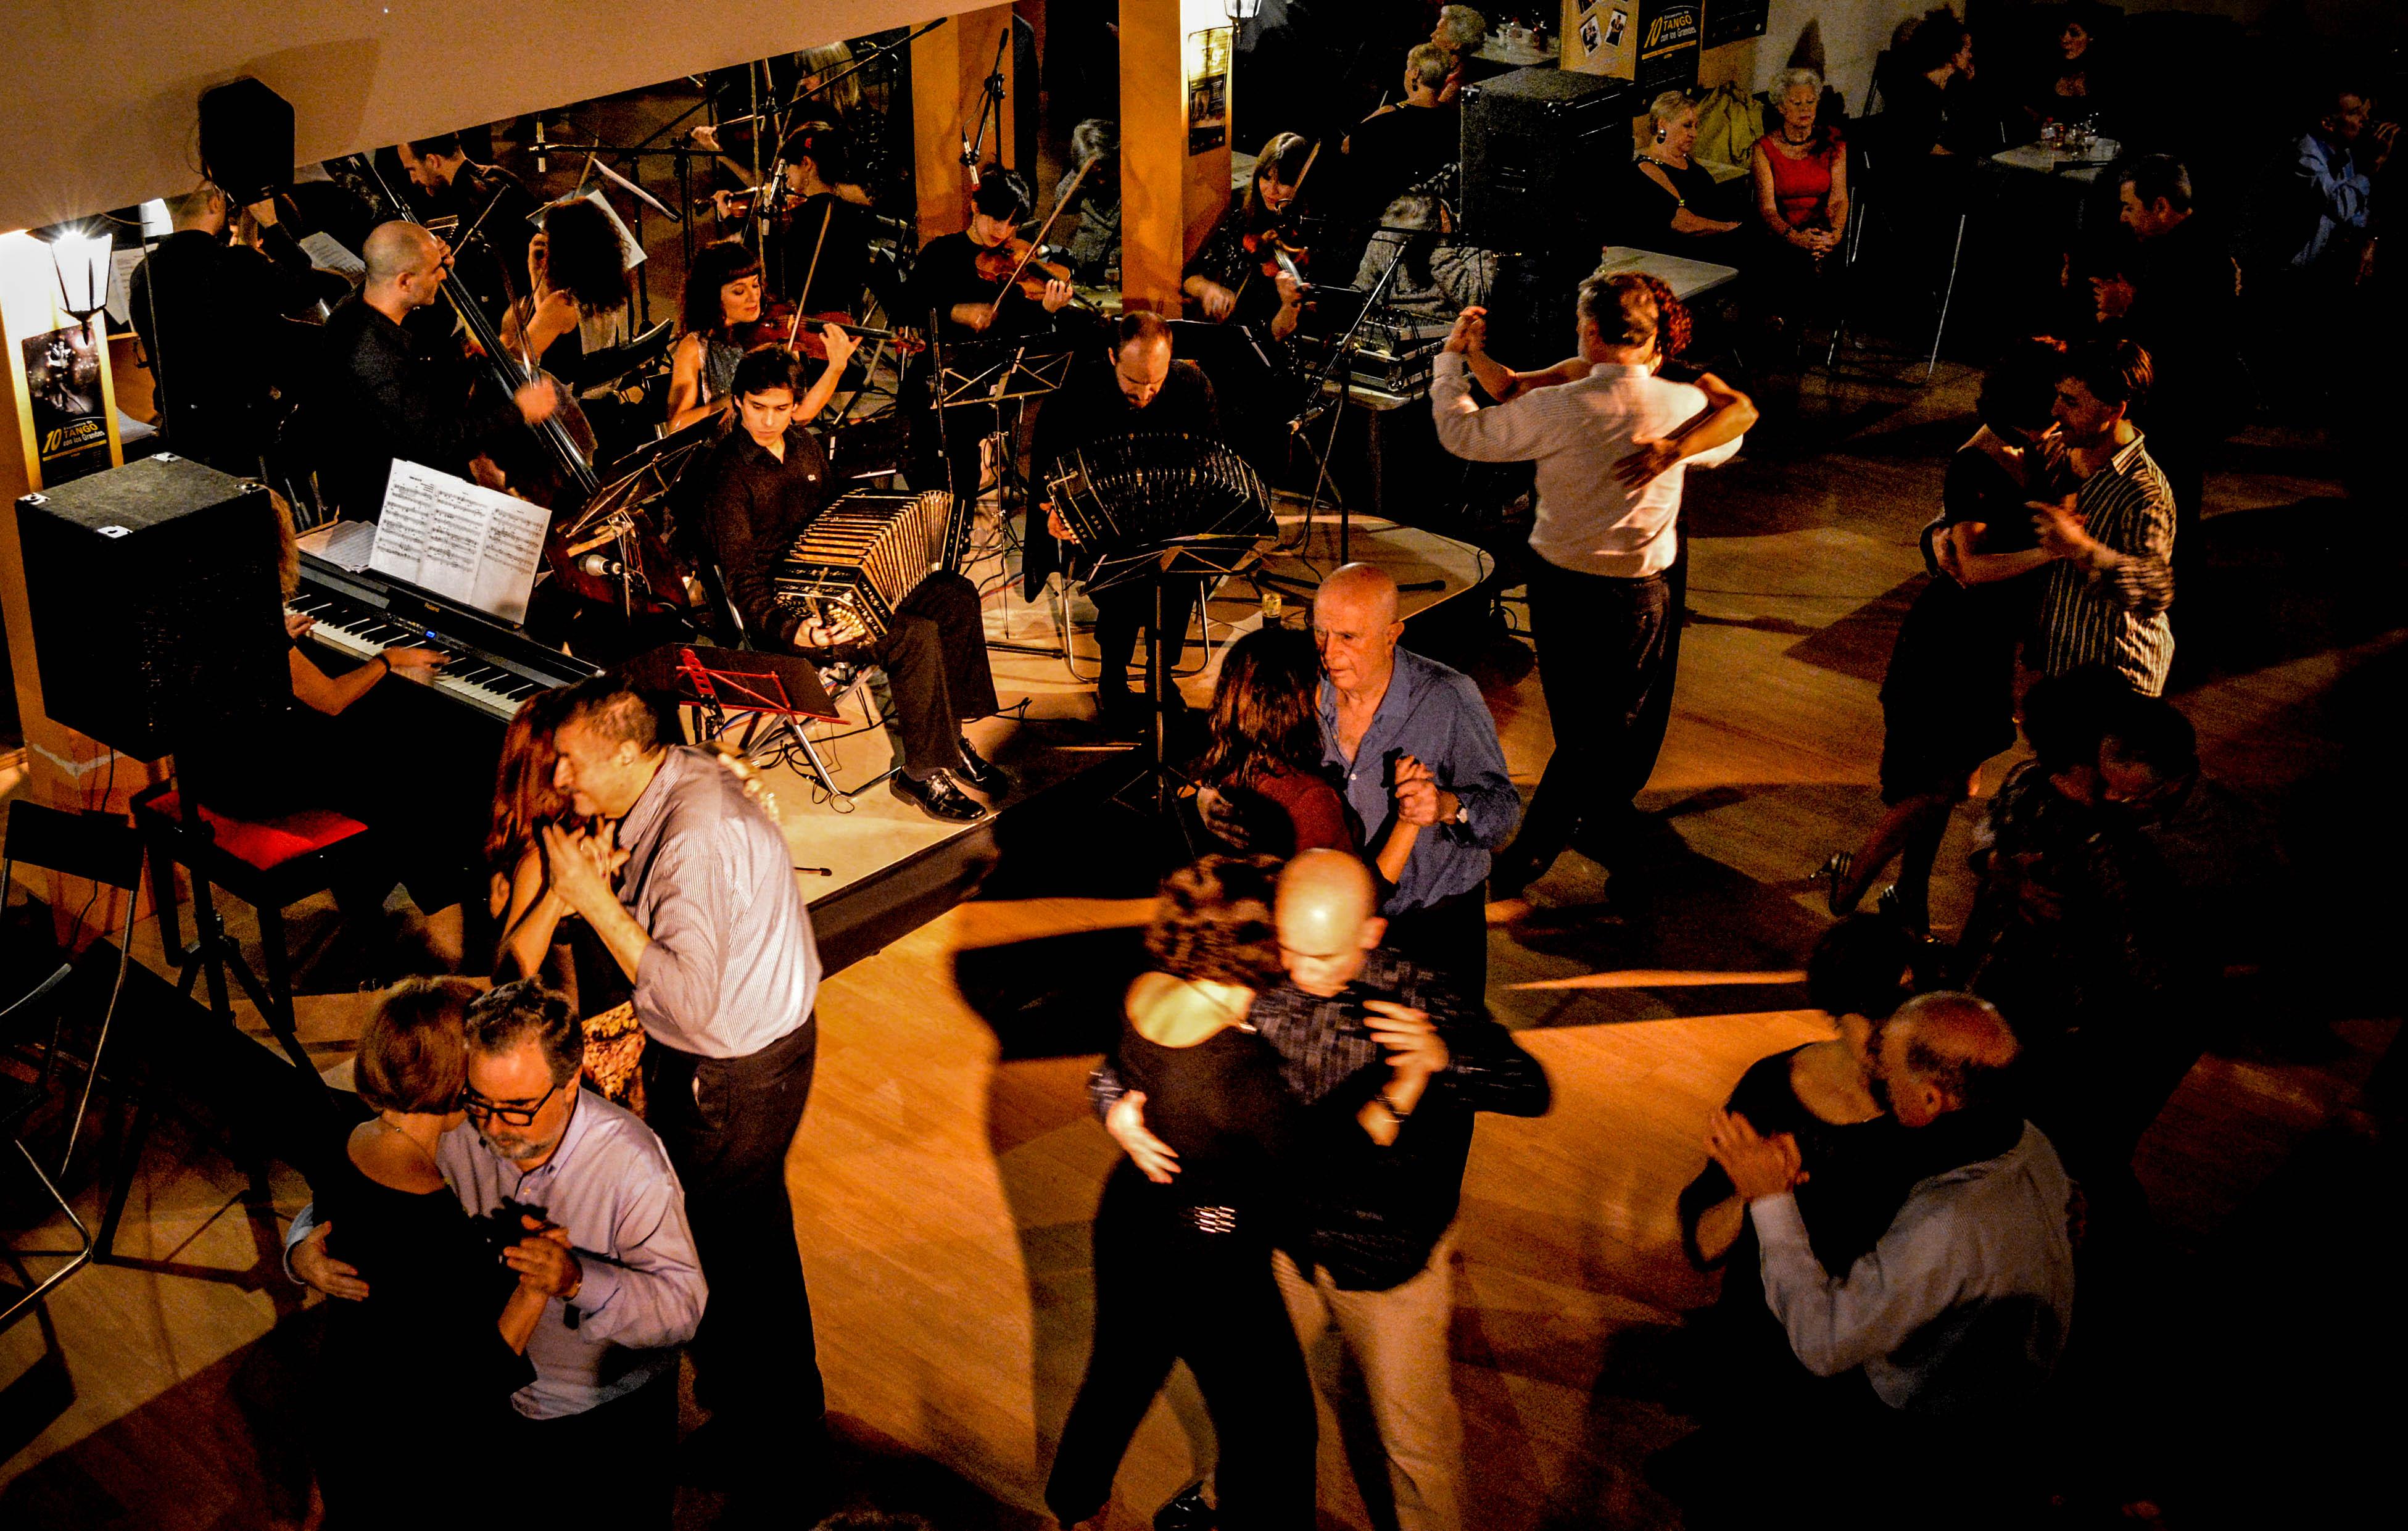 orquesta fest conventiyo 2015 (4 de 10)